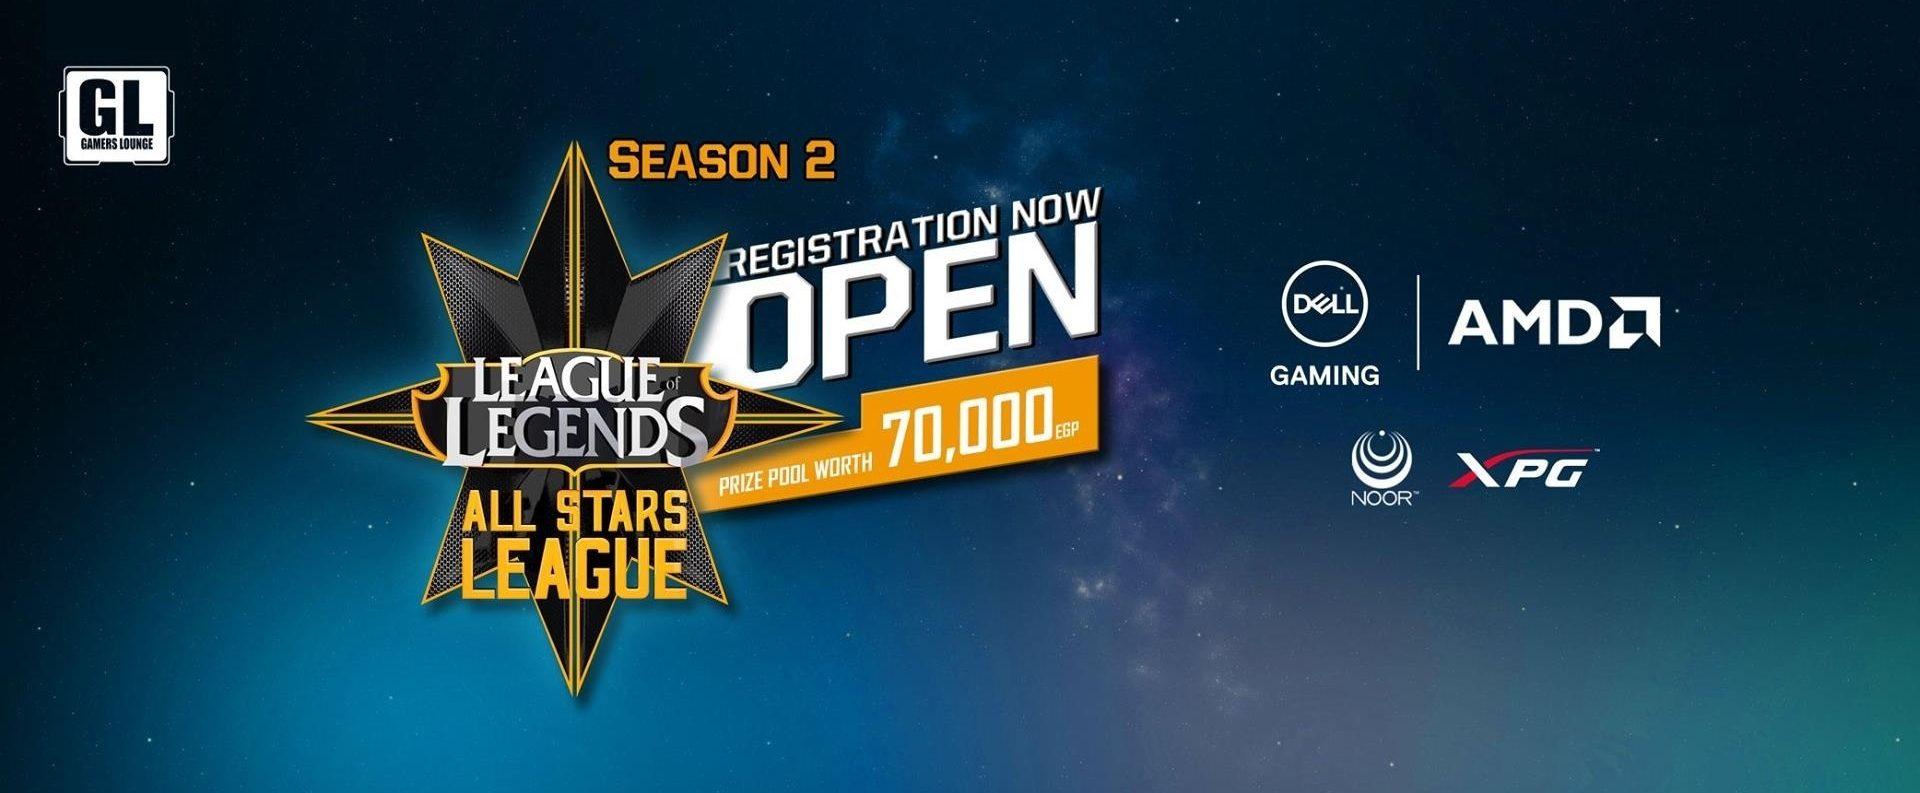 ASL Season 2 League of Legends mena